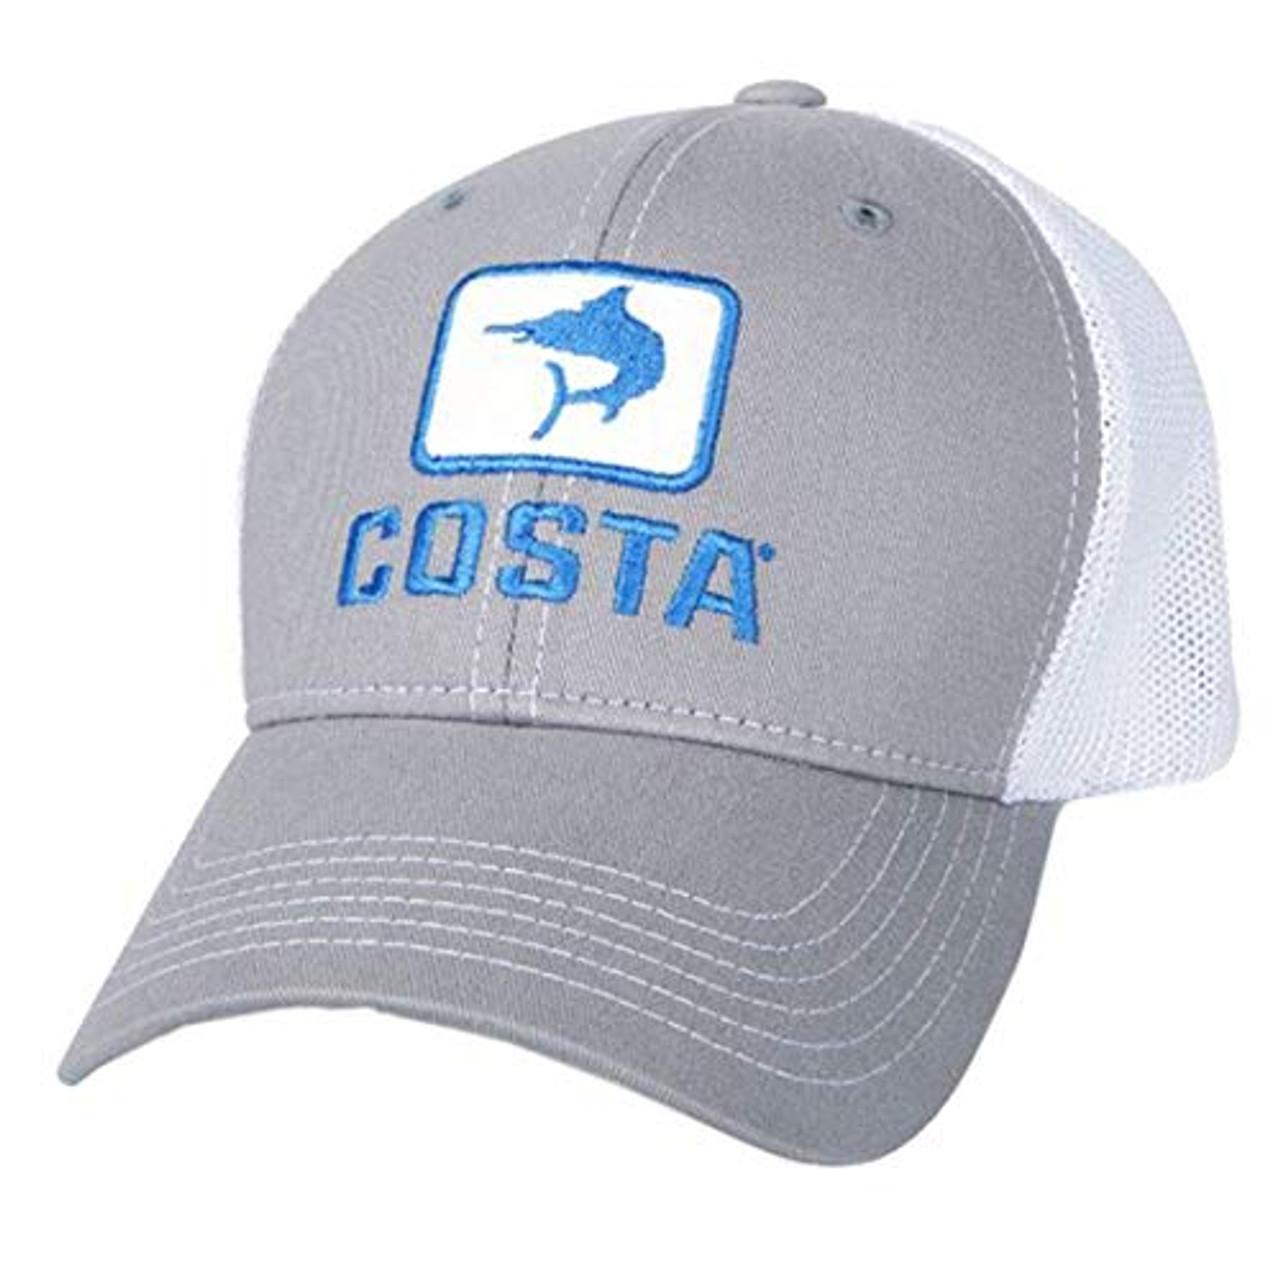 eb6d5cfa548df Costa Marlin Trucker Hat Gray White - Trenz Shirt Company